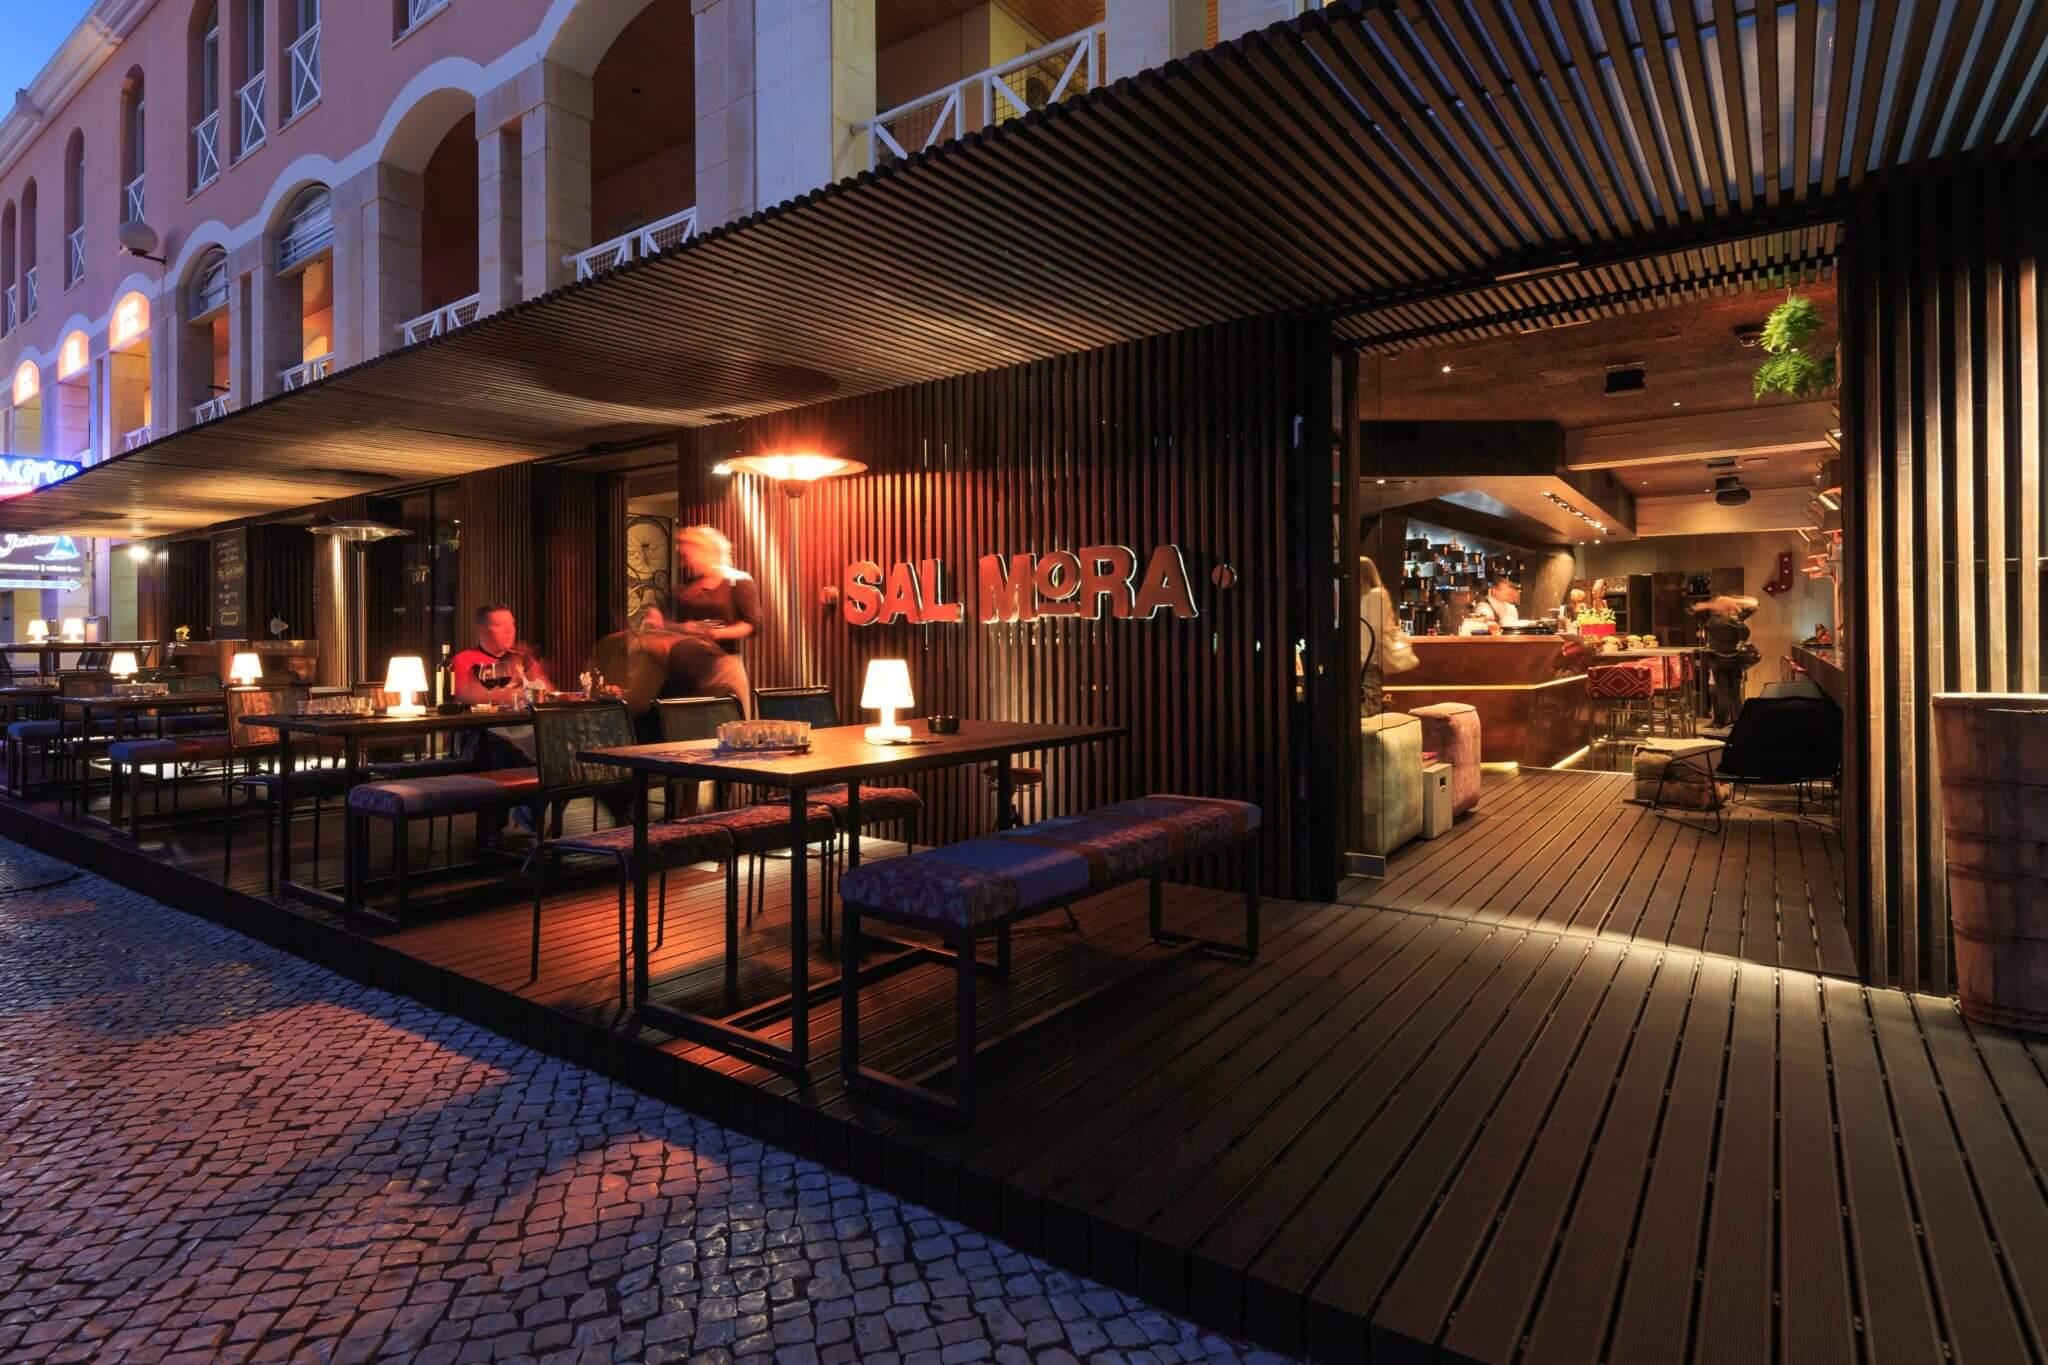 Restaurante Salmora